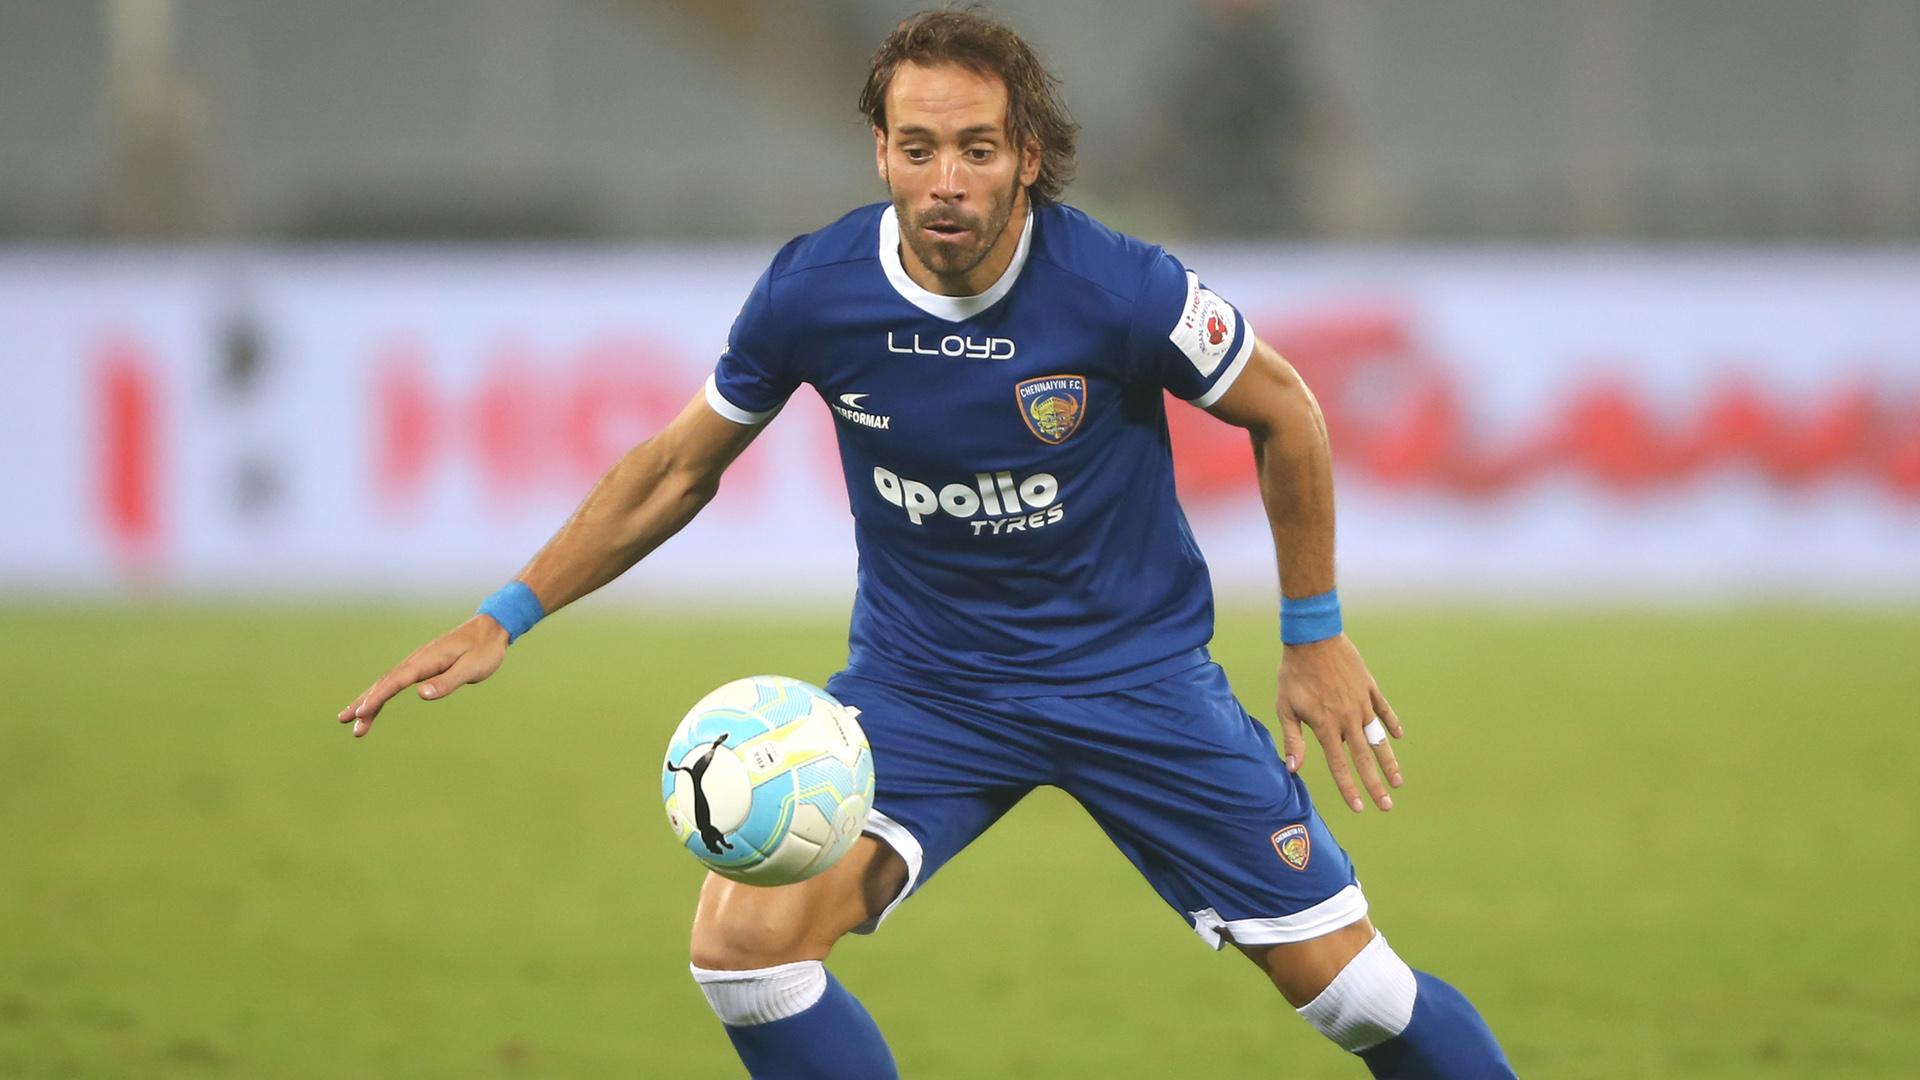 Inigo Calderon ATK Chennaiyin FC ISL 4 2017/2018